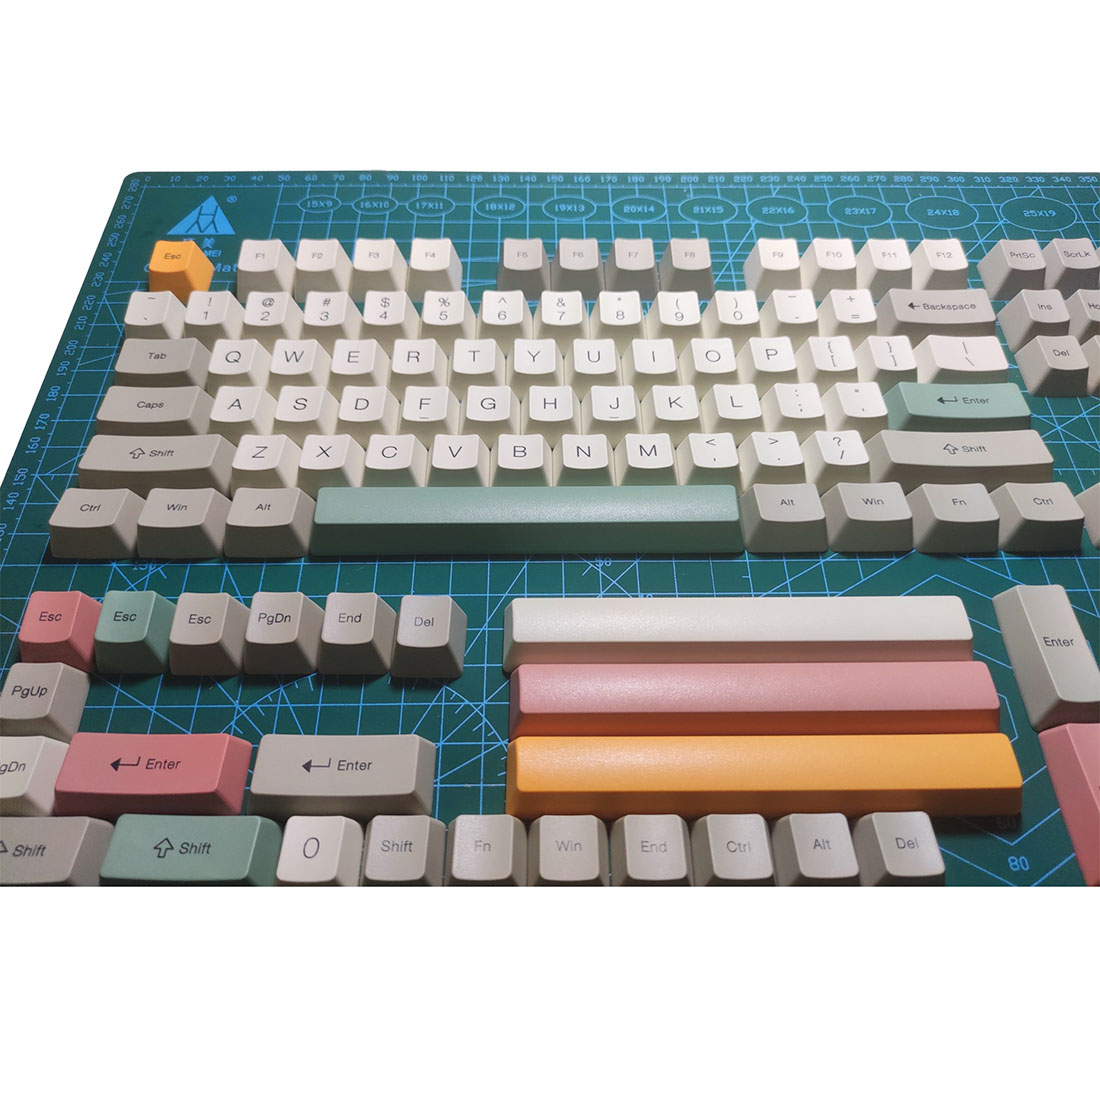 128pcs Keycaps Set Retro PBT Dye-sub with Puller for 61/64/87/96/104 Keys GH60 RK61 Matrix Joke Custom Mechanical Gaming Keyboard